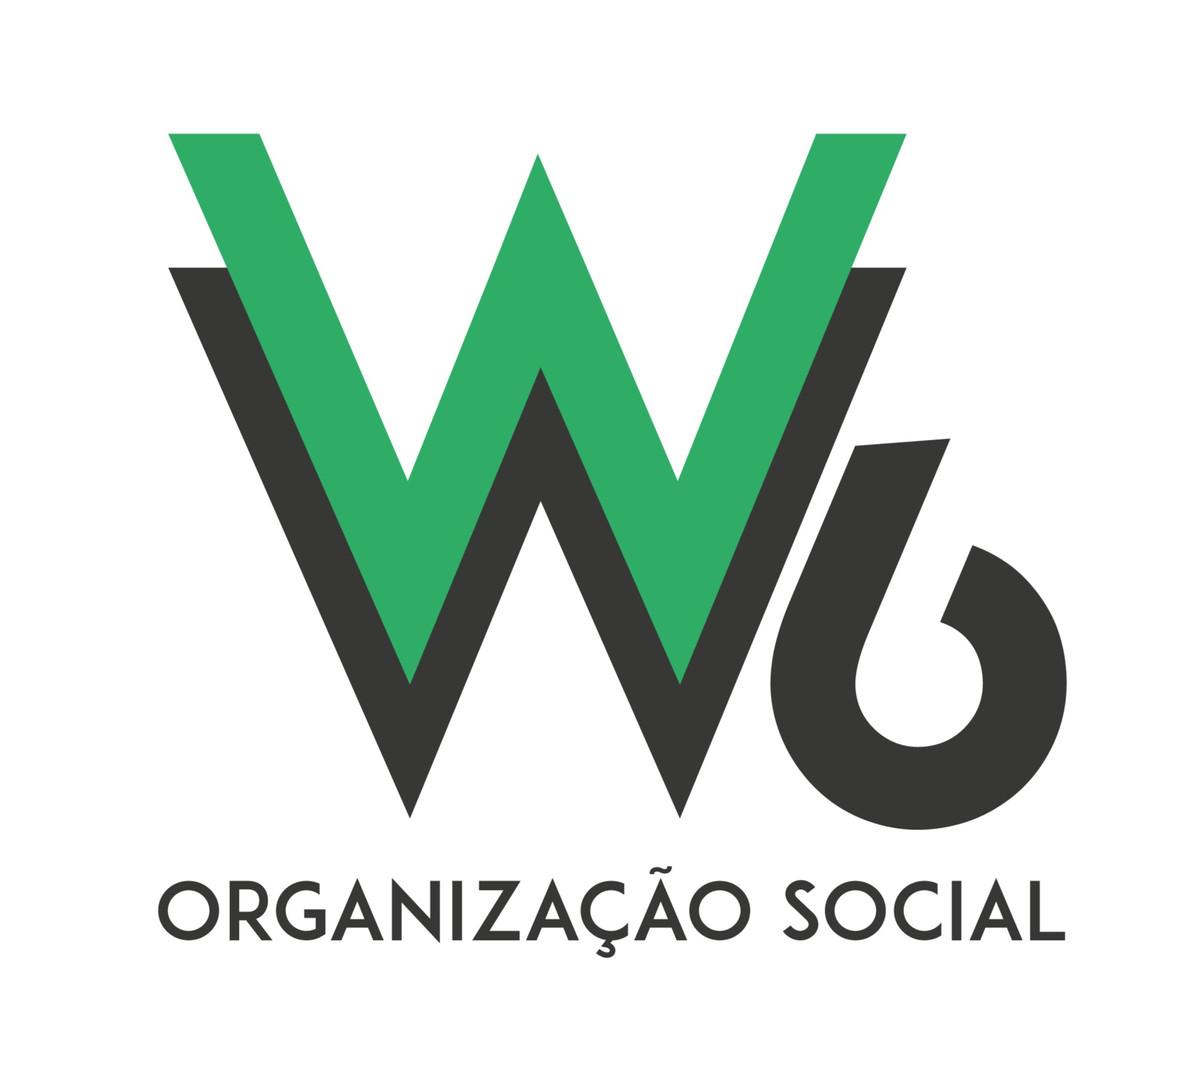 W6_LOGOMARCA-01%20(1)_edited.jpg